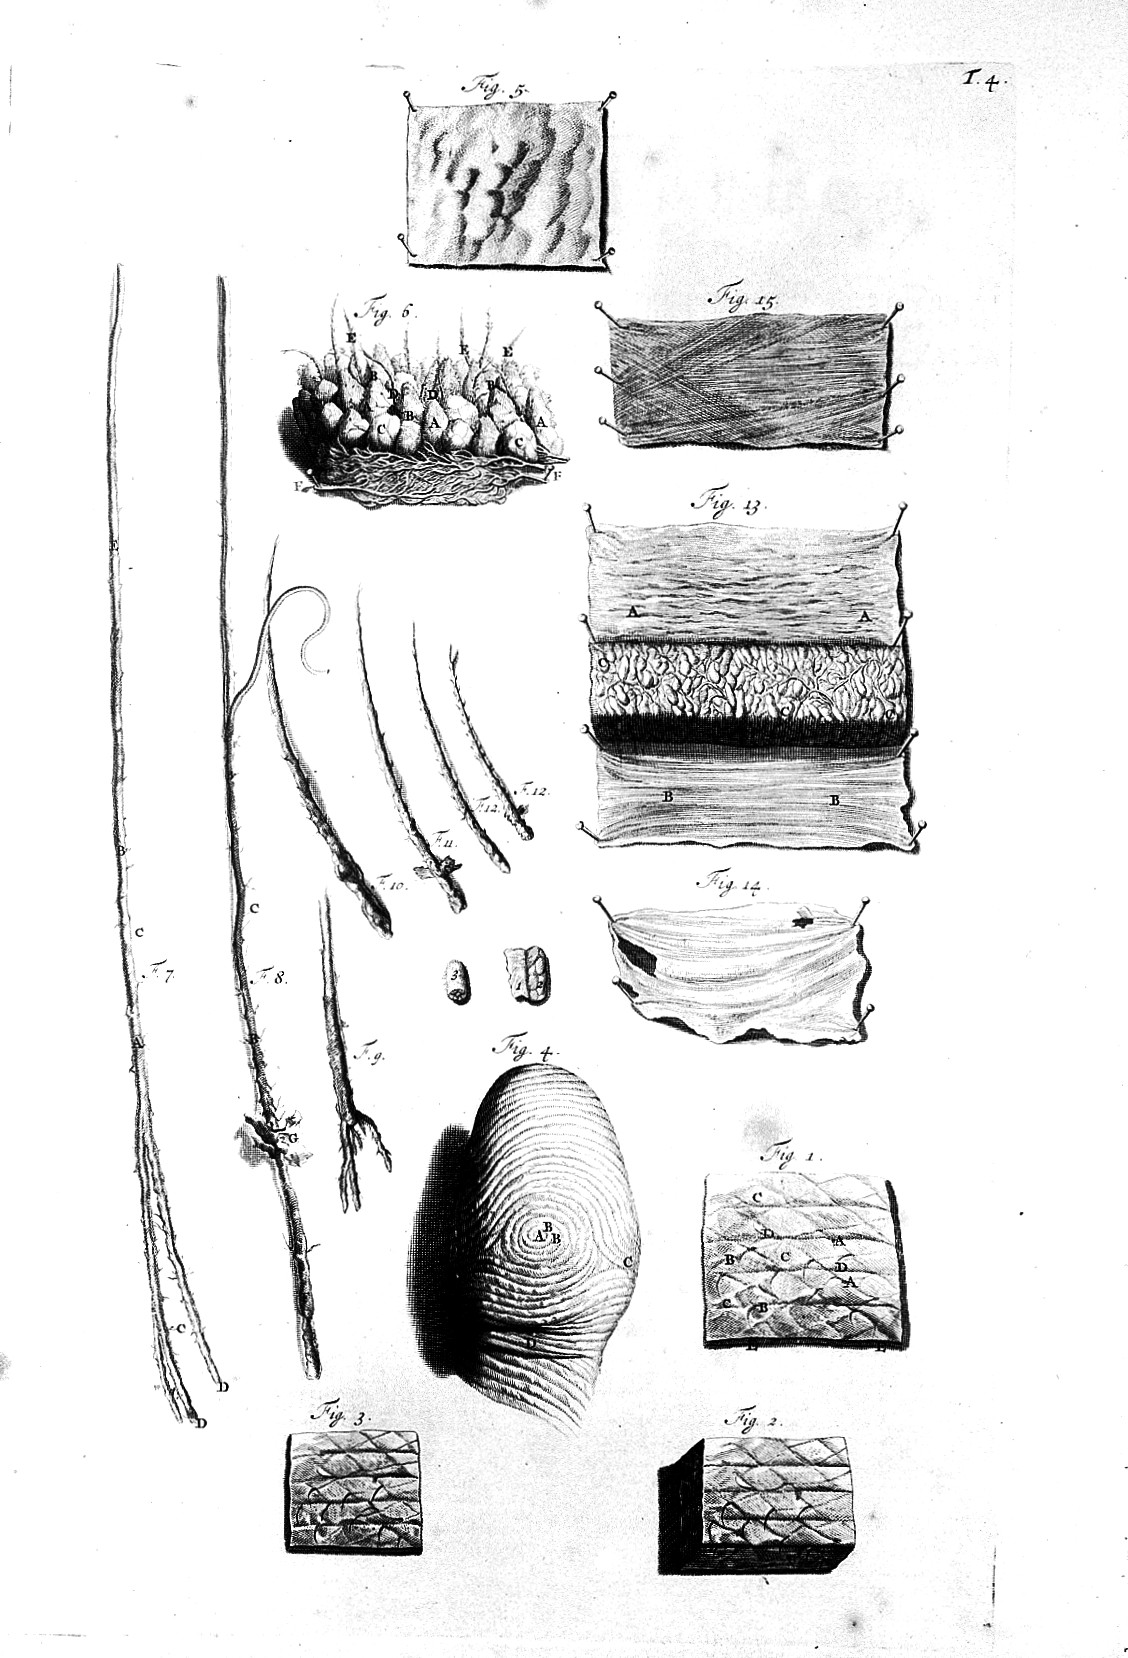 Filethe Anatomy Of Humane Bodies Skin And Hair Follicles Wellcome